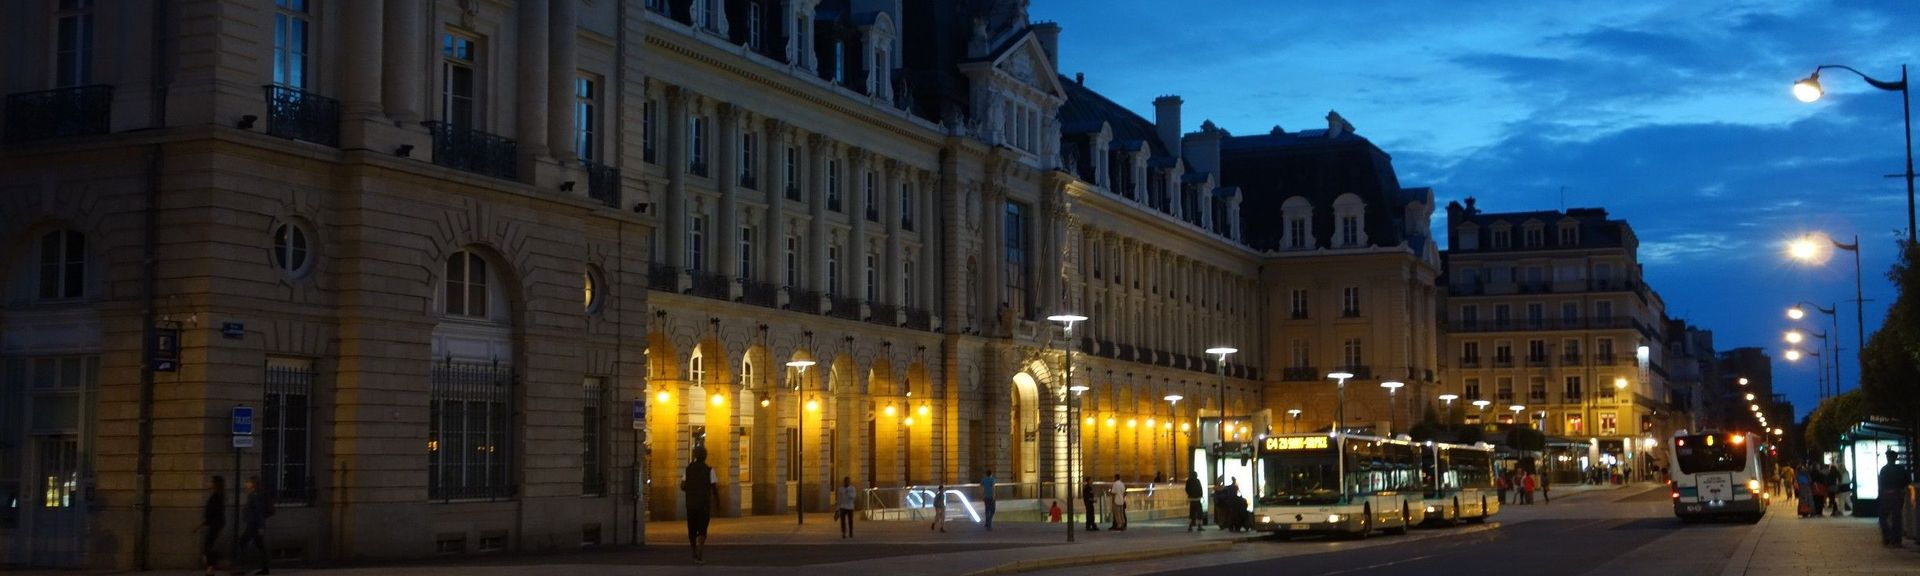 Zentrum, Rennes, Ille-et-Vilaine, Frankreich